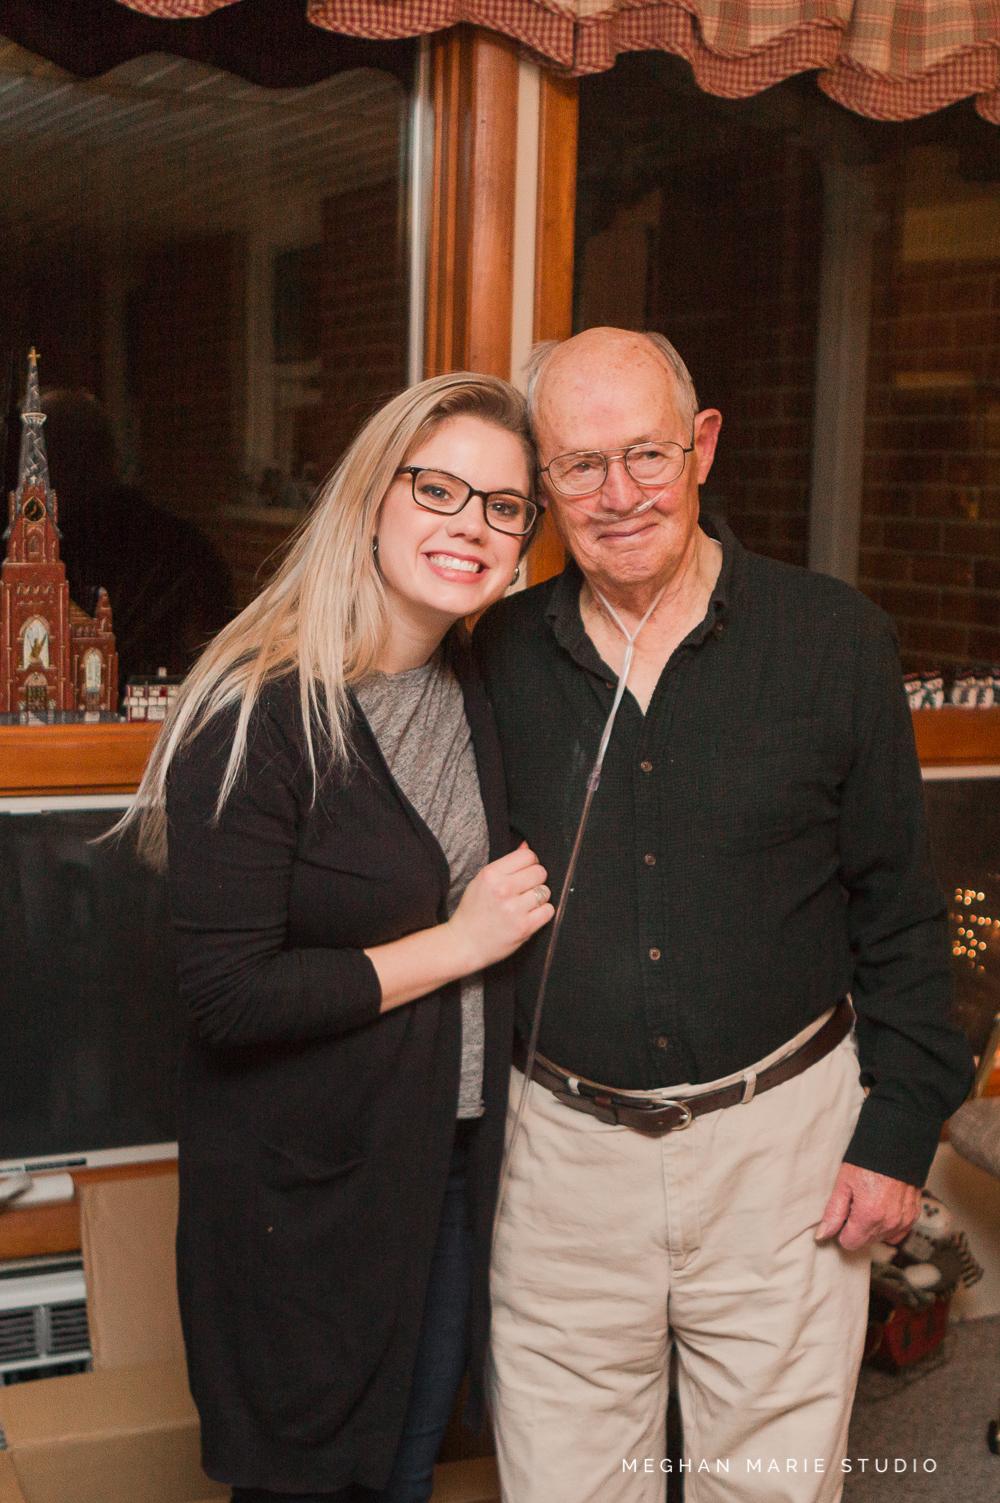 My last photo with Grandpa.